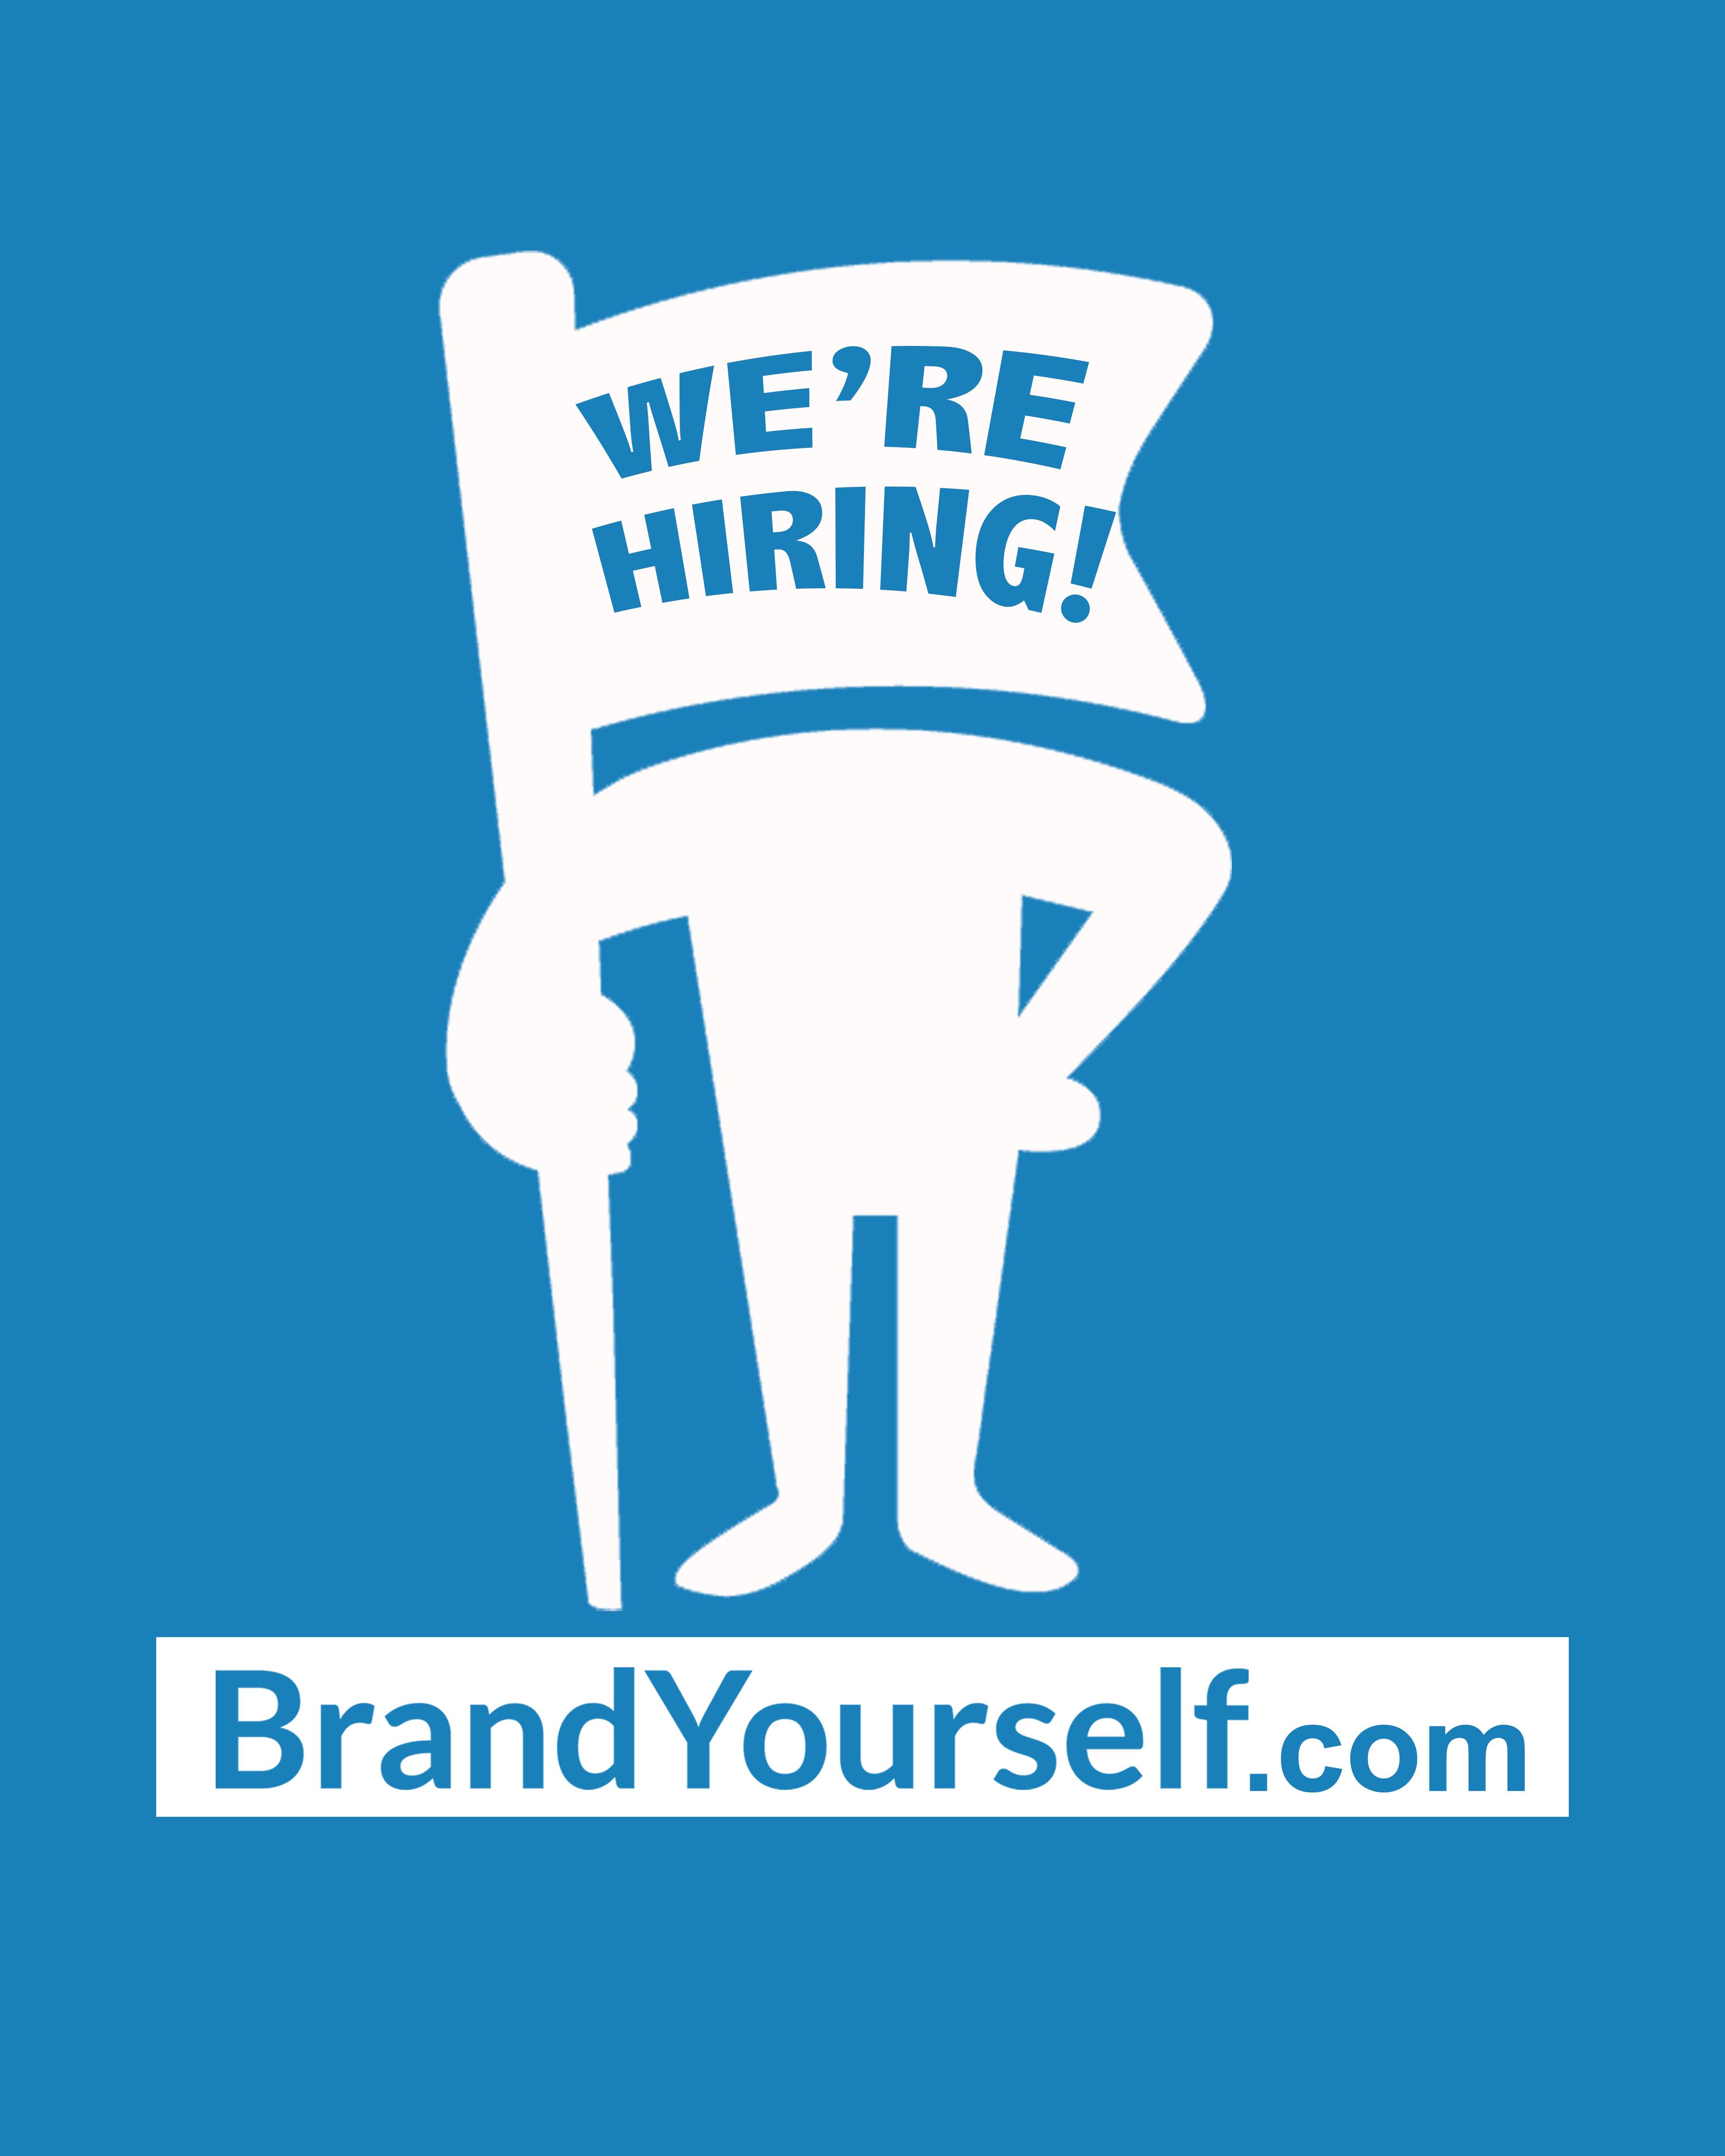 BrandYourself is Hiring Director of Sales and Marketing